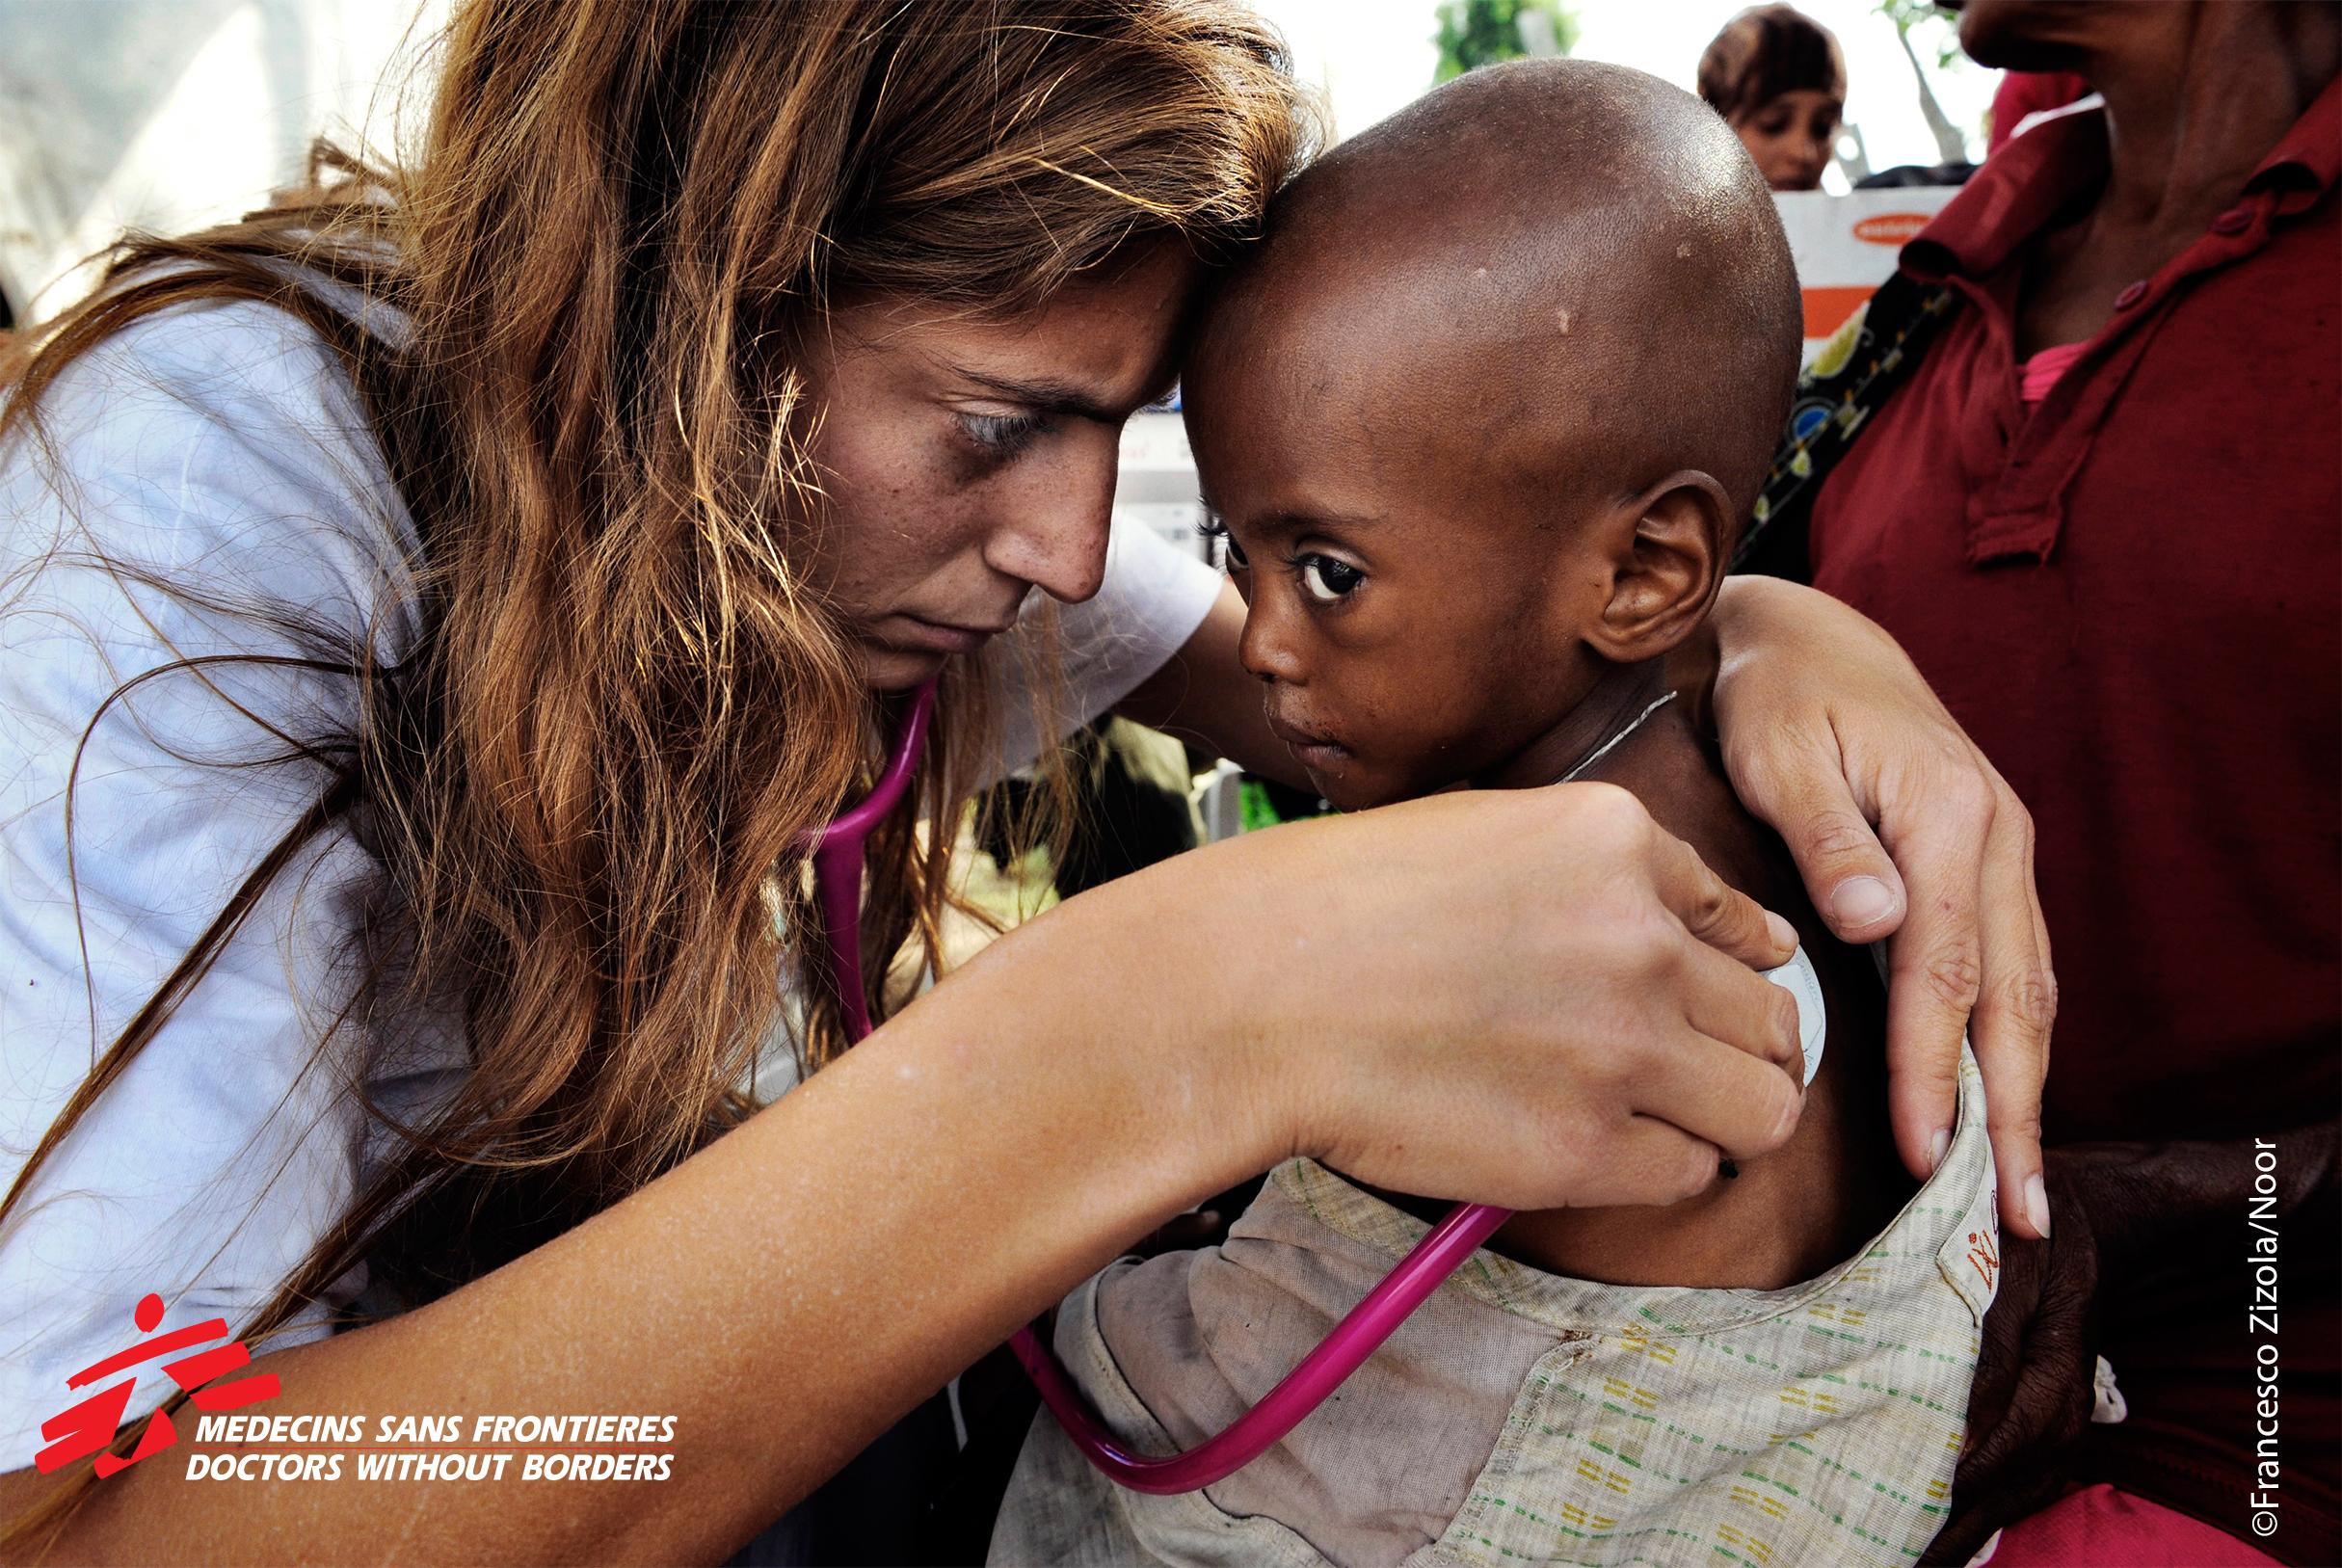 Malnourished patient, copyright Francesco Zizola.jpg